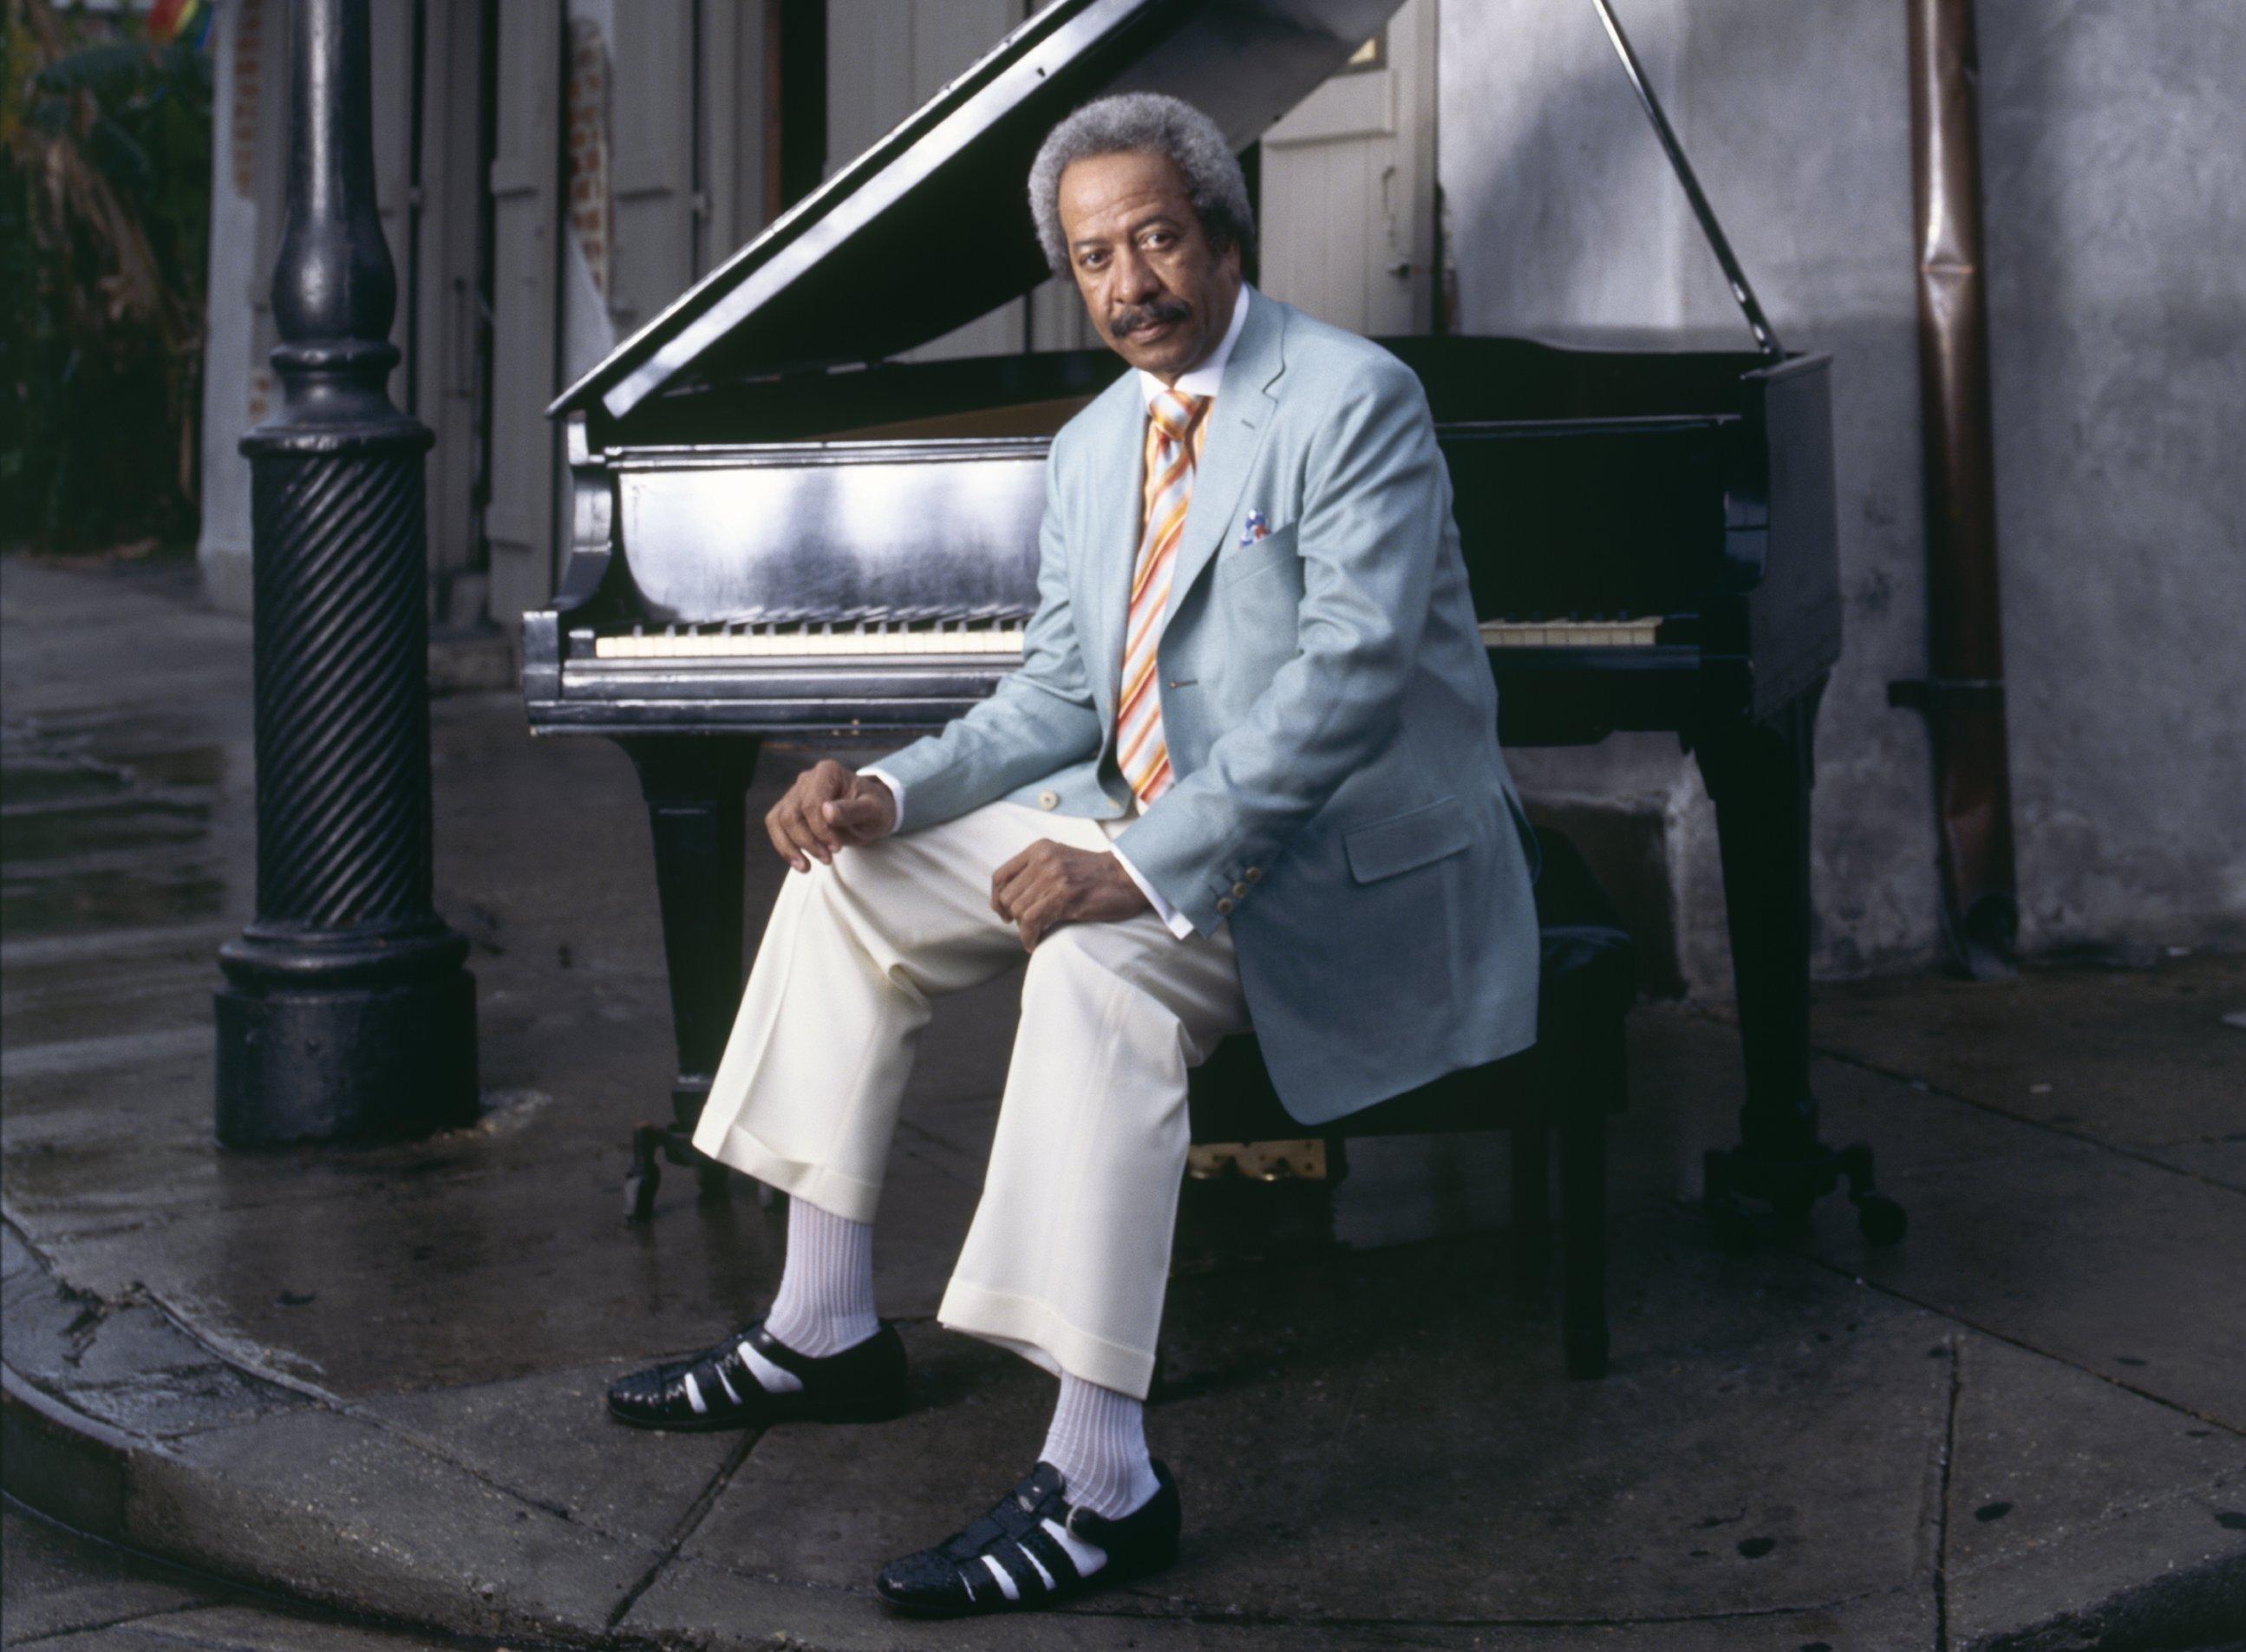 Allen Toussaint y su inseparable piano. Foto: Lee Crum